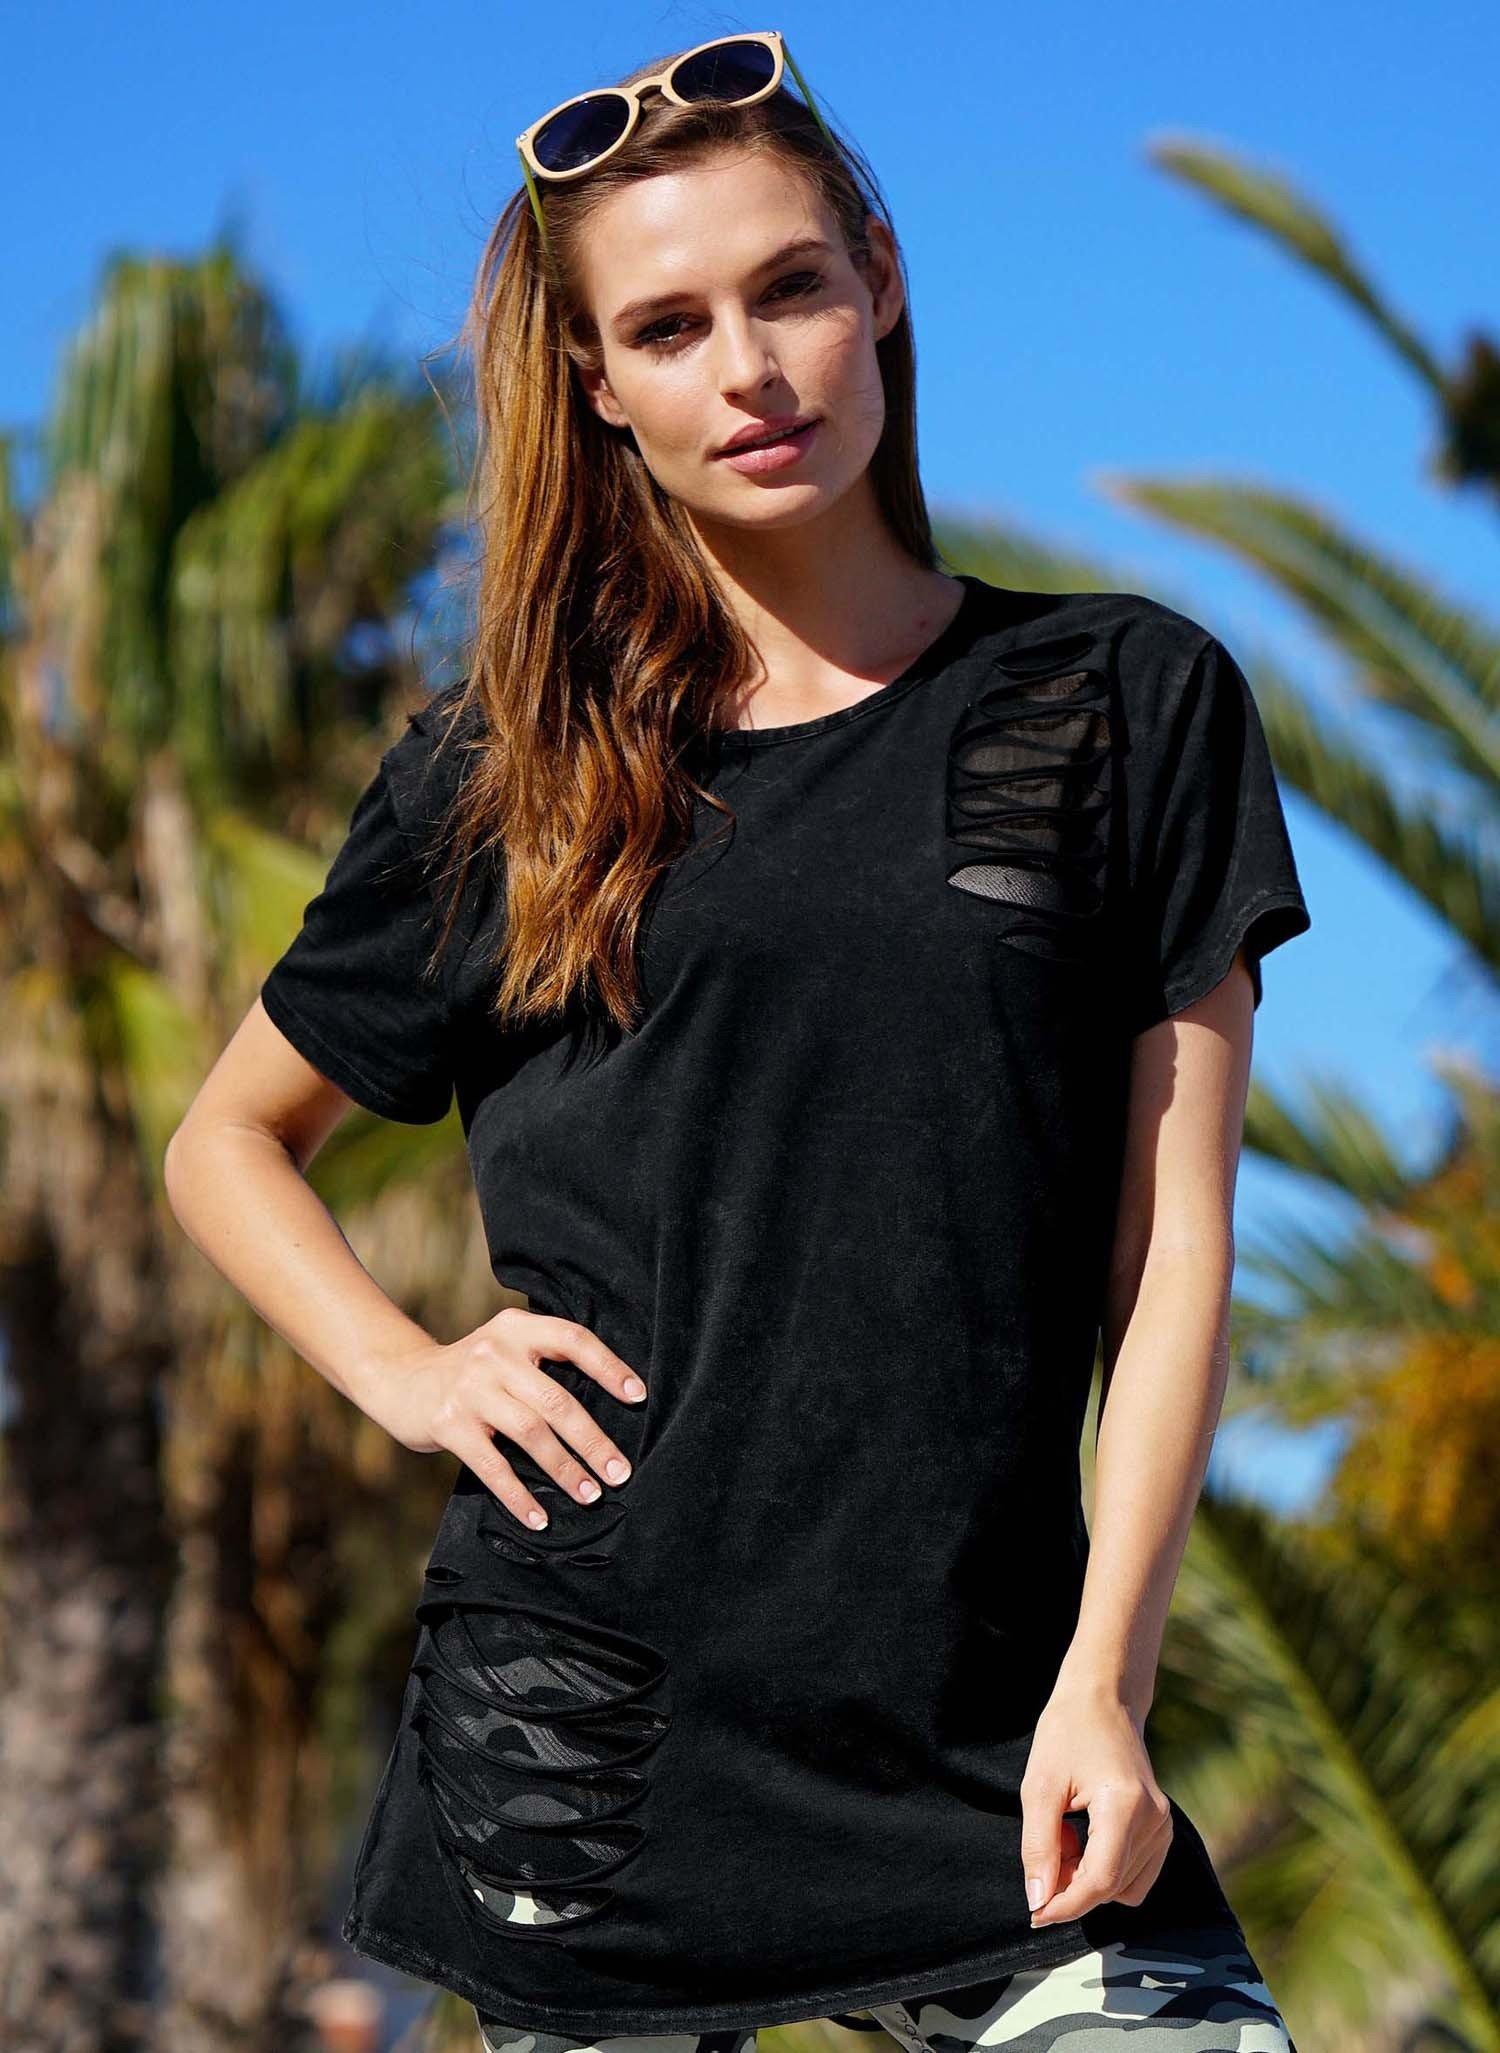 D-KA-Shirt,Loch-App.schwarz L 010 - 1 - Ronja.ch